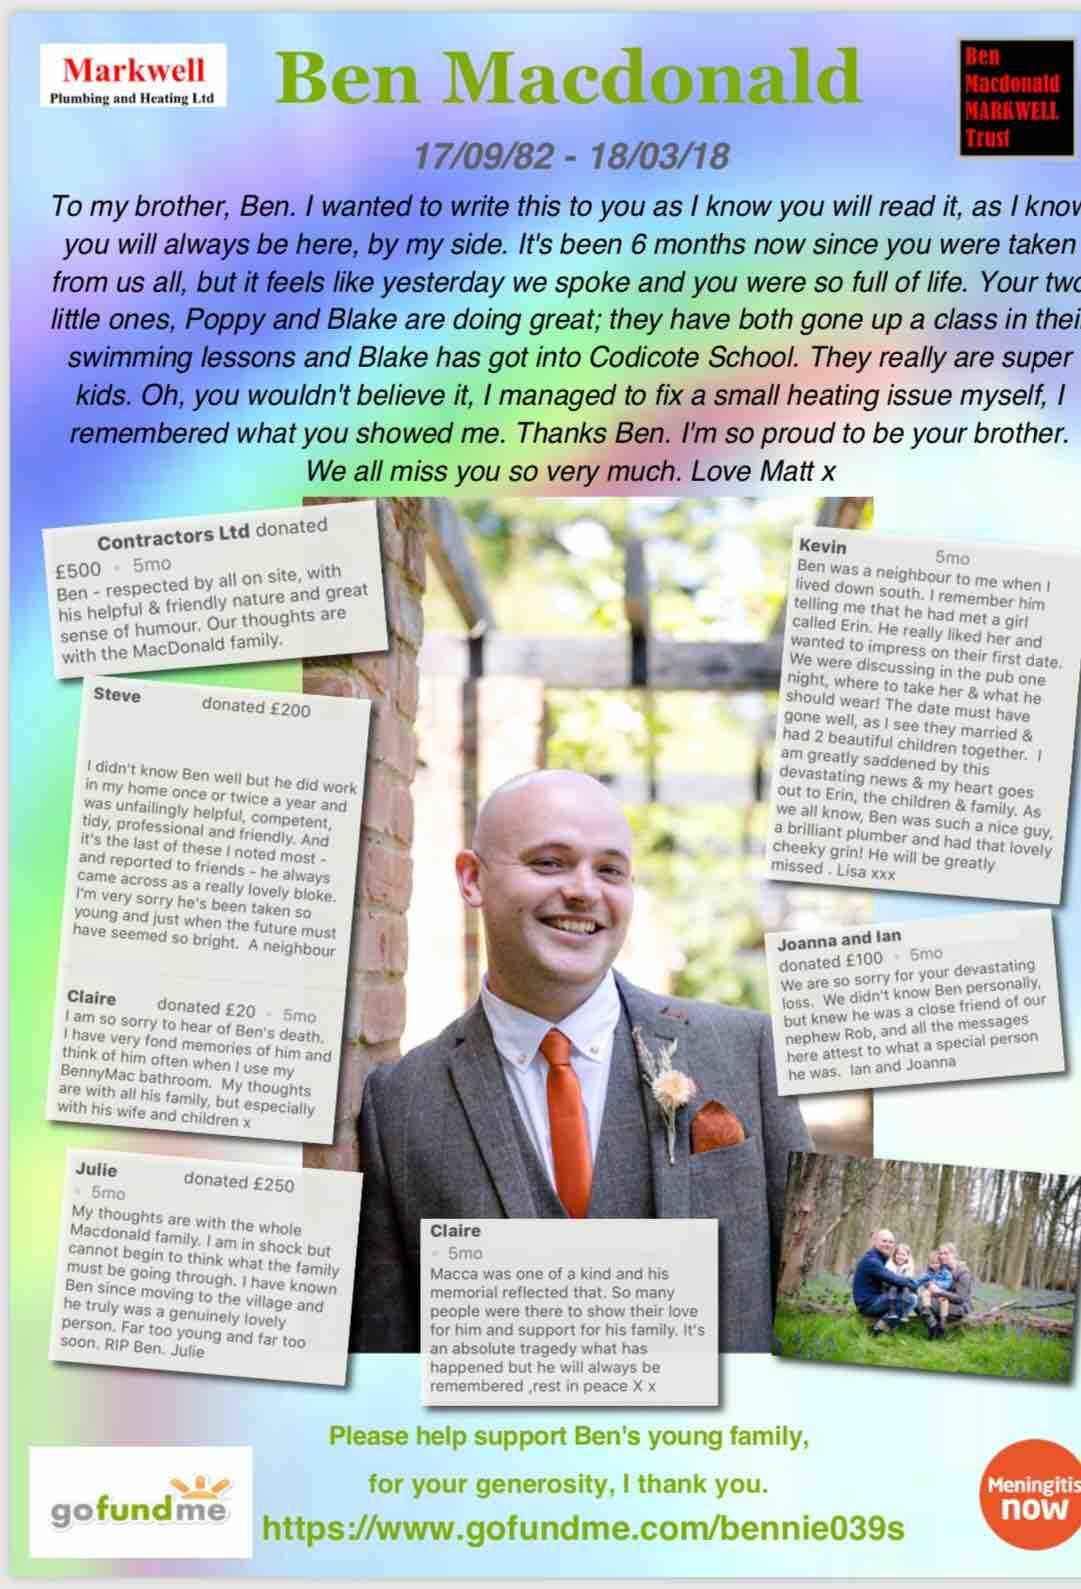 Fundraiser by Matthew Macdonald : Please help Benny's wife